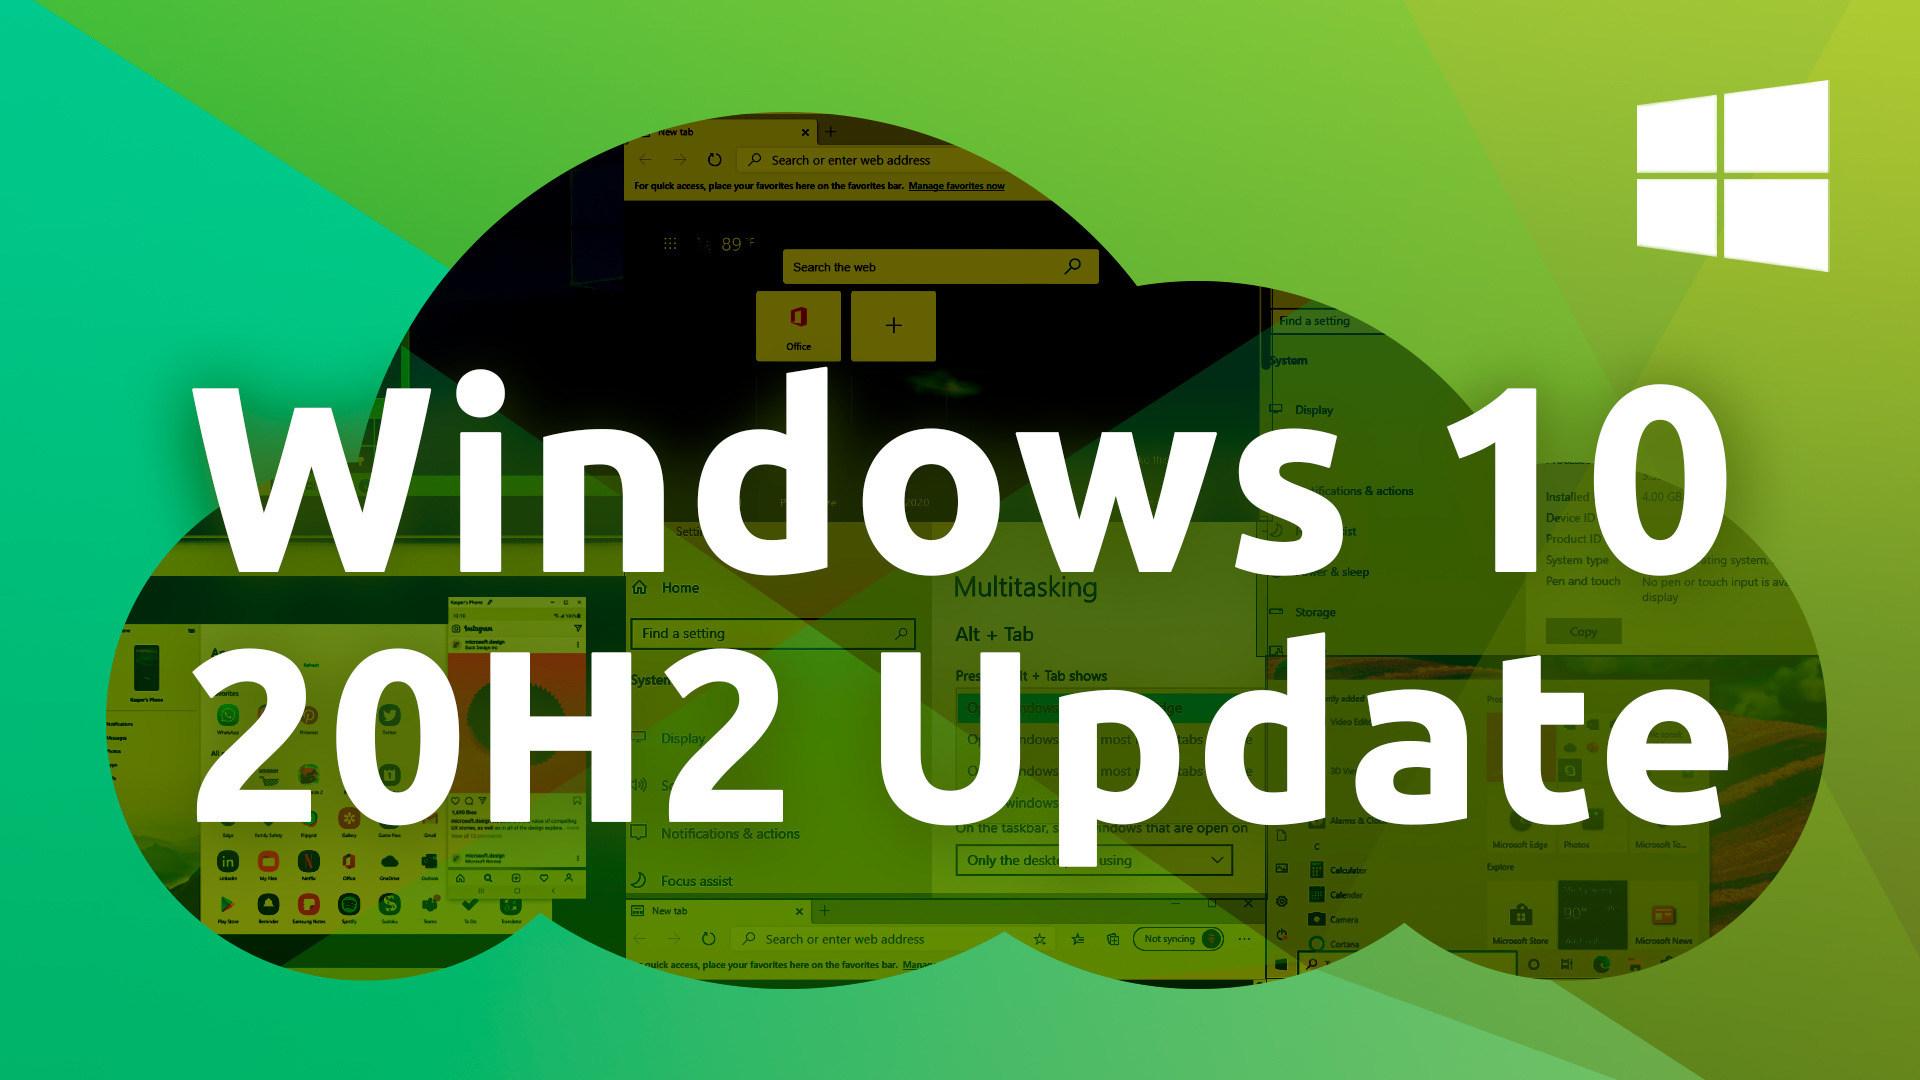 Microsoft, Betriebssystem, Windows 10, Update, 20h2, Windows 10 Oktober Update, Windows 10 Update, Windows 10 Herbst Update, Herbst, Windows 10 20H2, Windows 10 Fall Update, Herbst Update, Windows 10 Oktober 2020 Update, Windows 10 20H2 Update, Windows 10 Oktober 2020, Windows Cloud